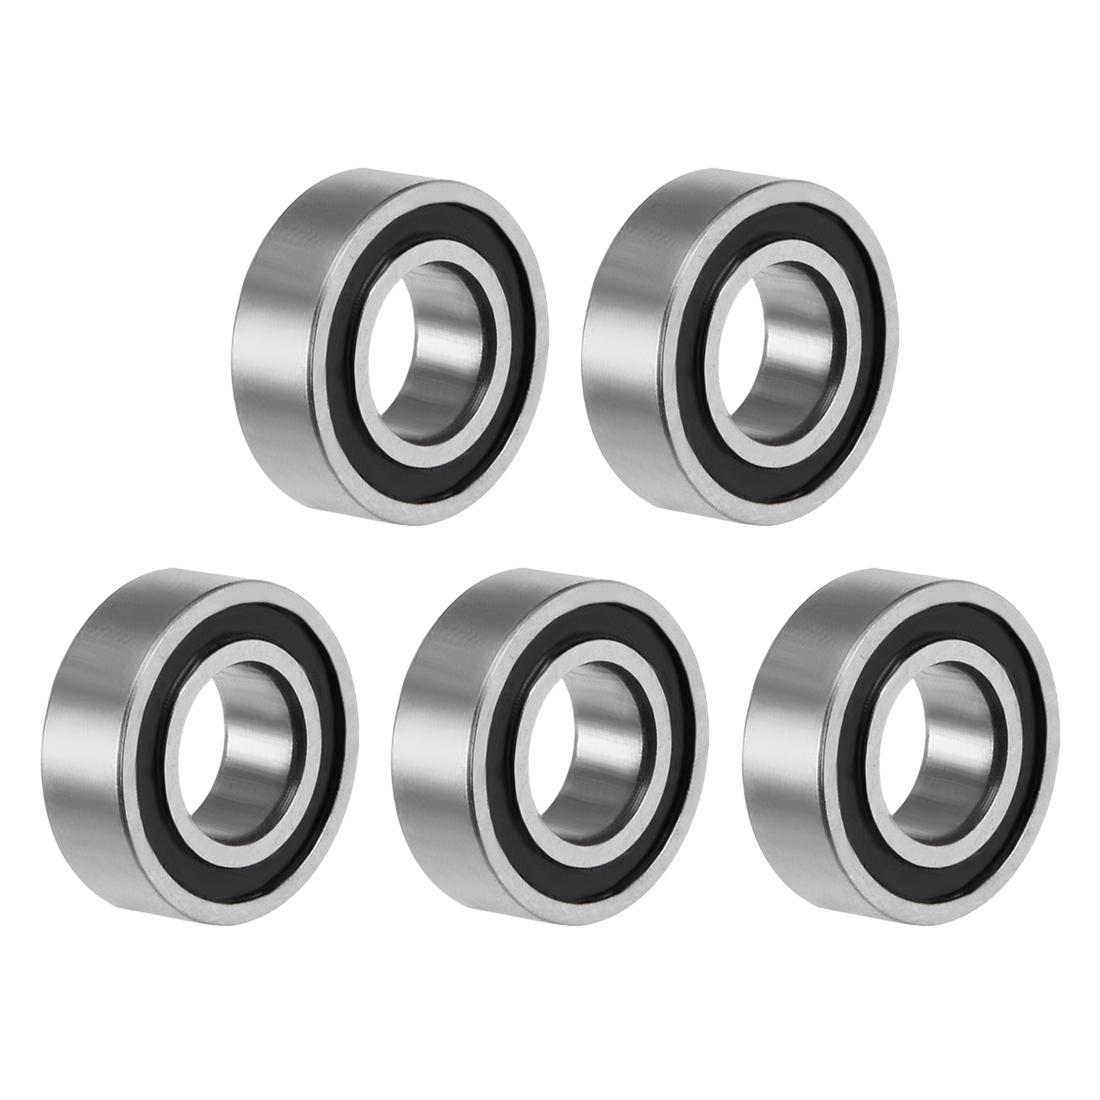 "R166-2RS Ball Bearing 3/16""x3/8""x1/8"" Double Sealed ABEC-3 Bearings 5pcs"